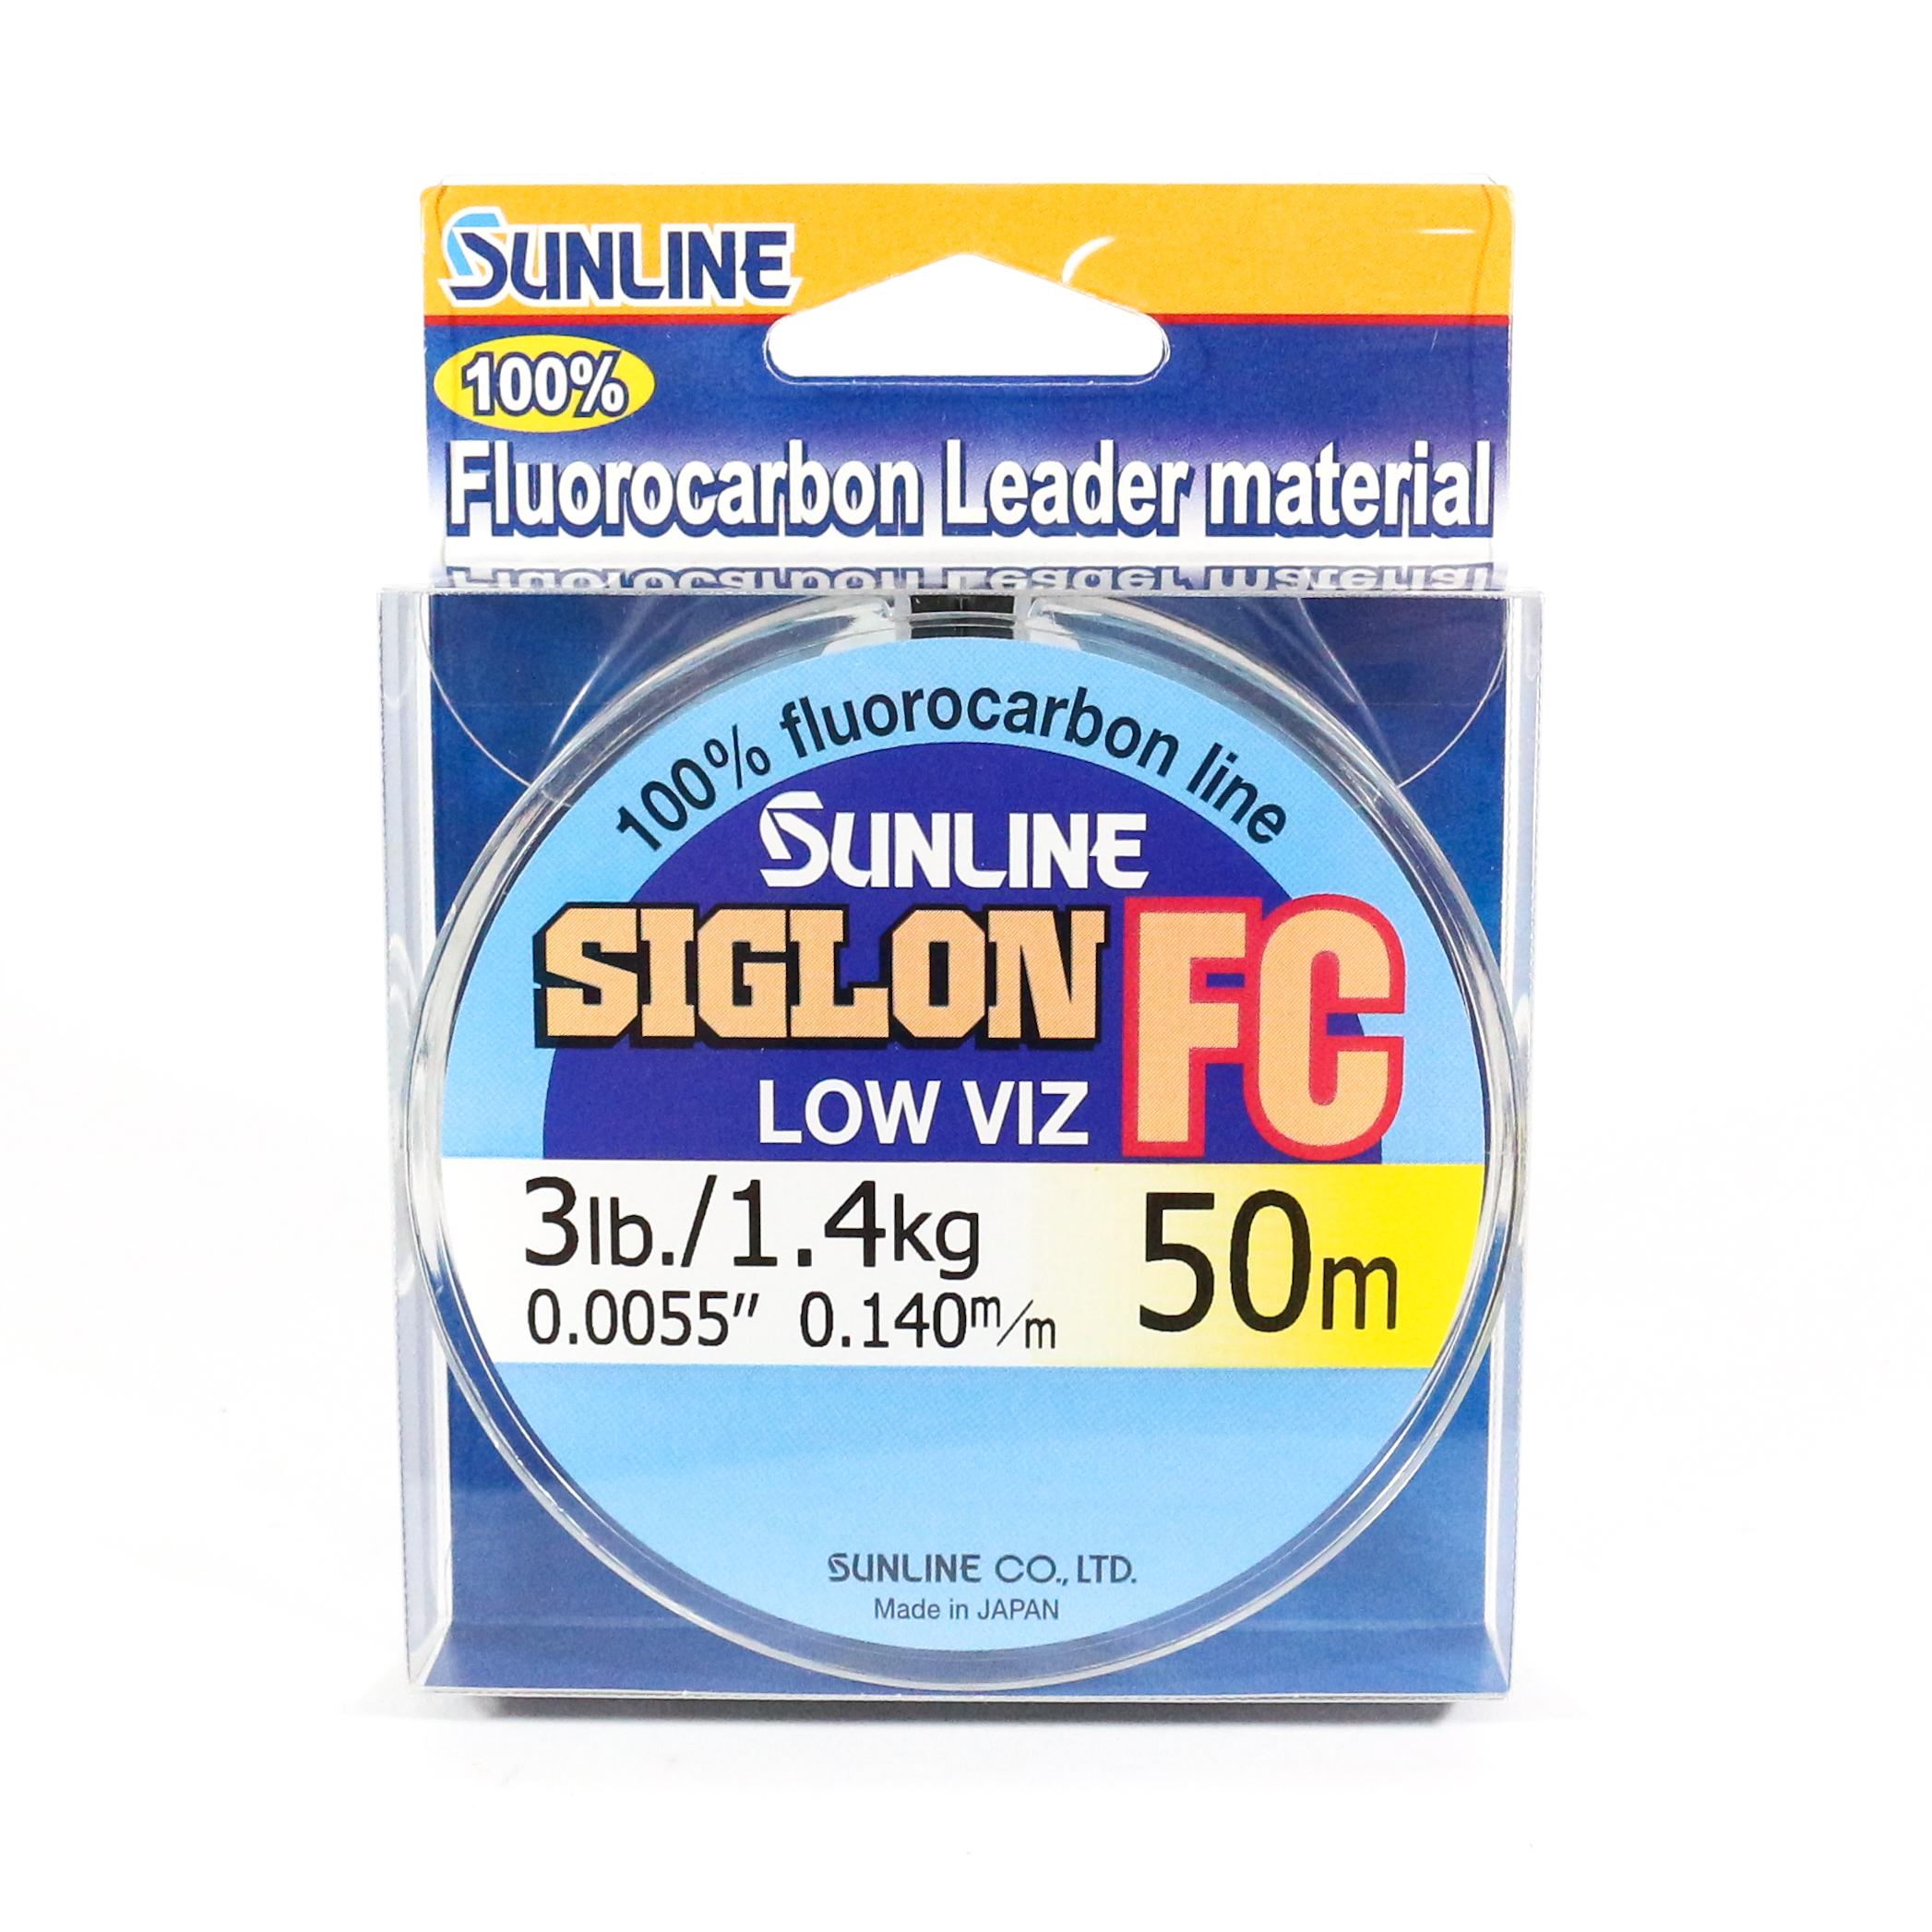 Sunline Siglon FC Fluorocarbon Line 50m 3lb Diameter 0.14 mm (5792)